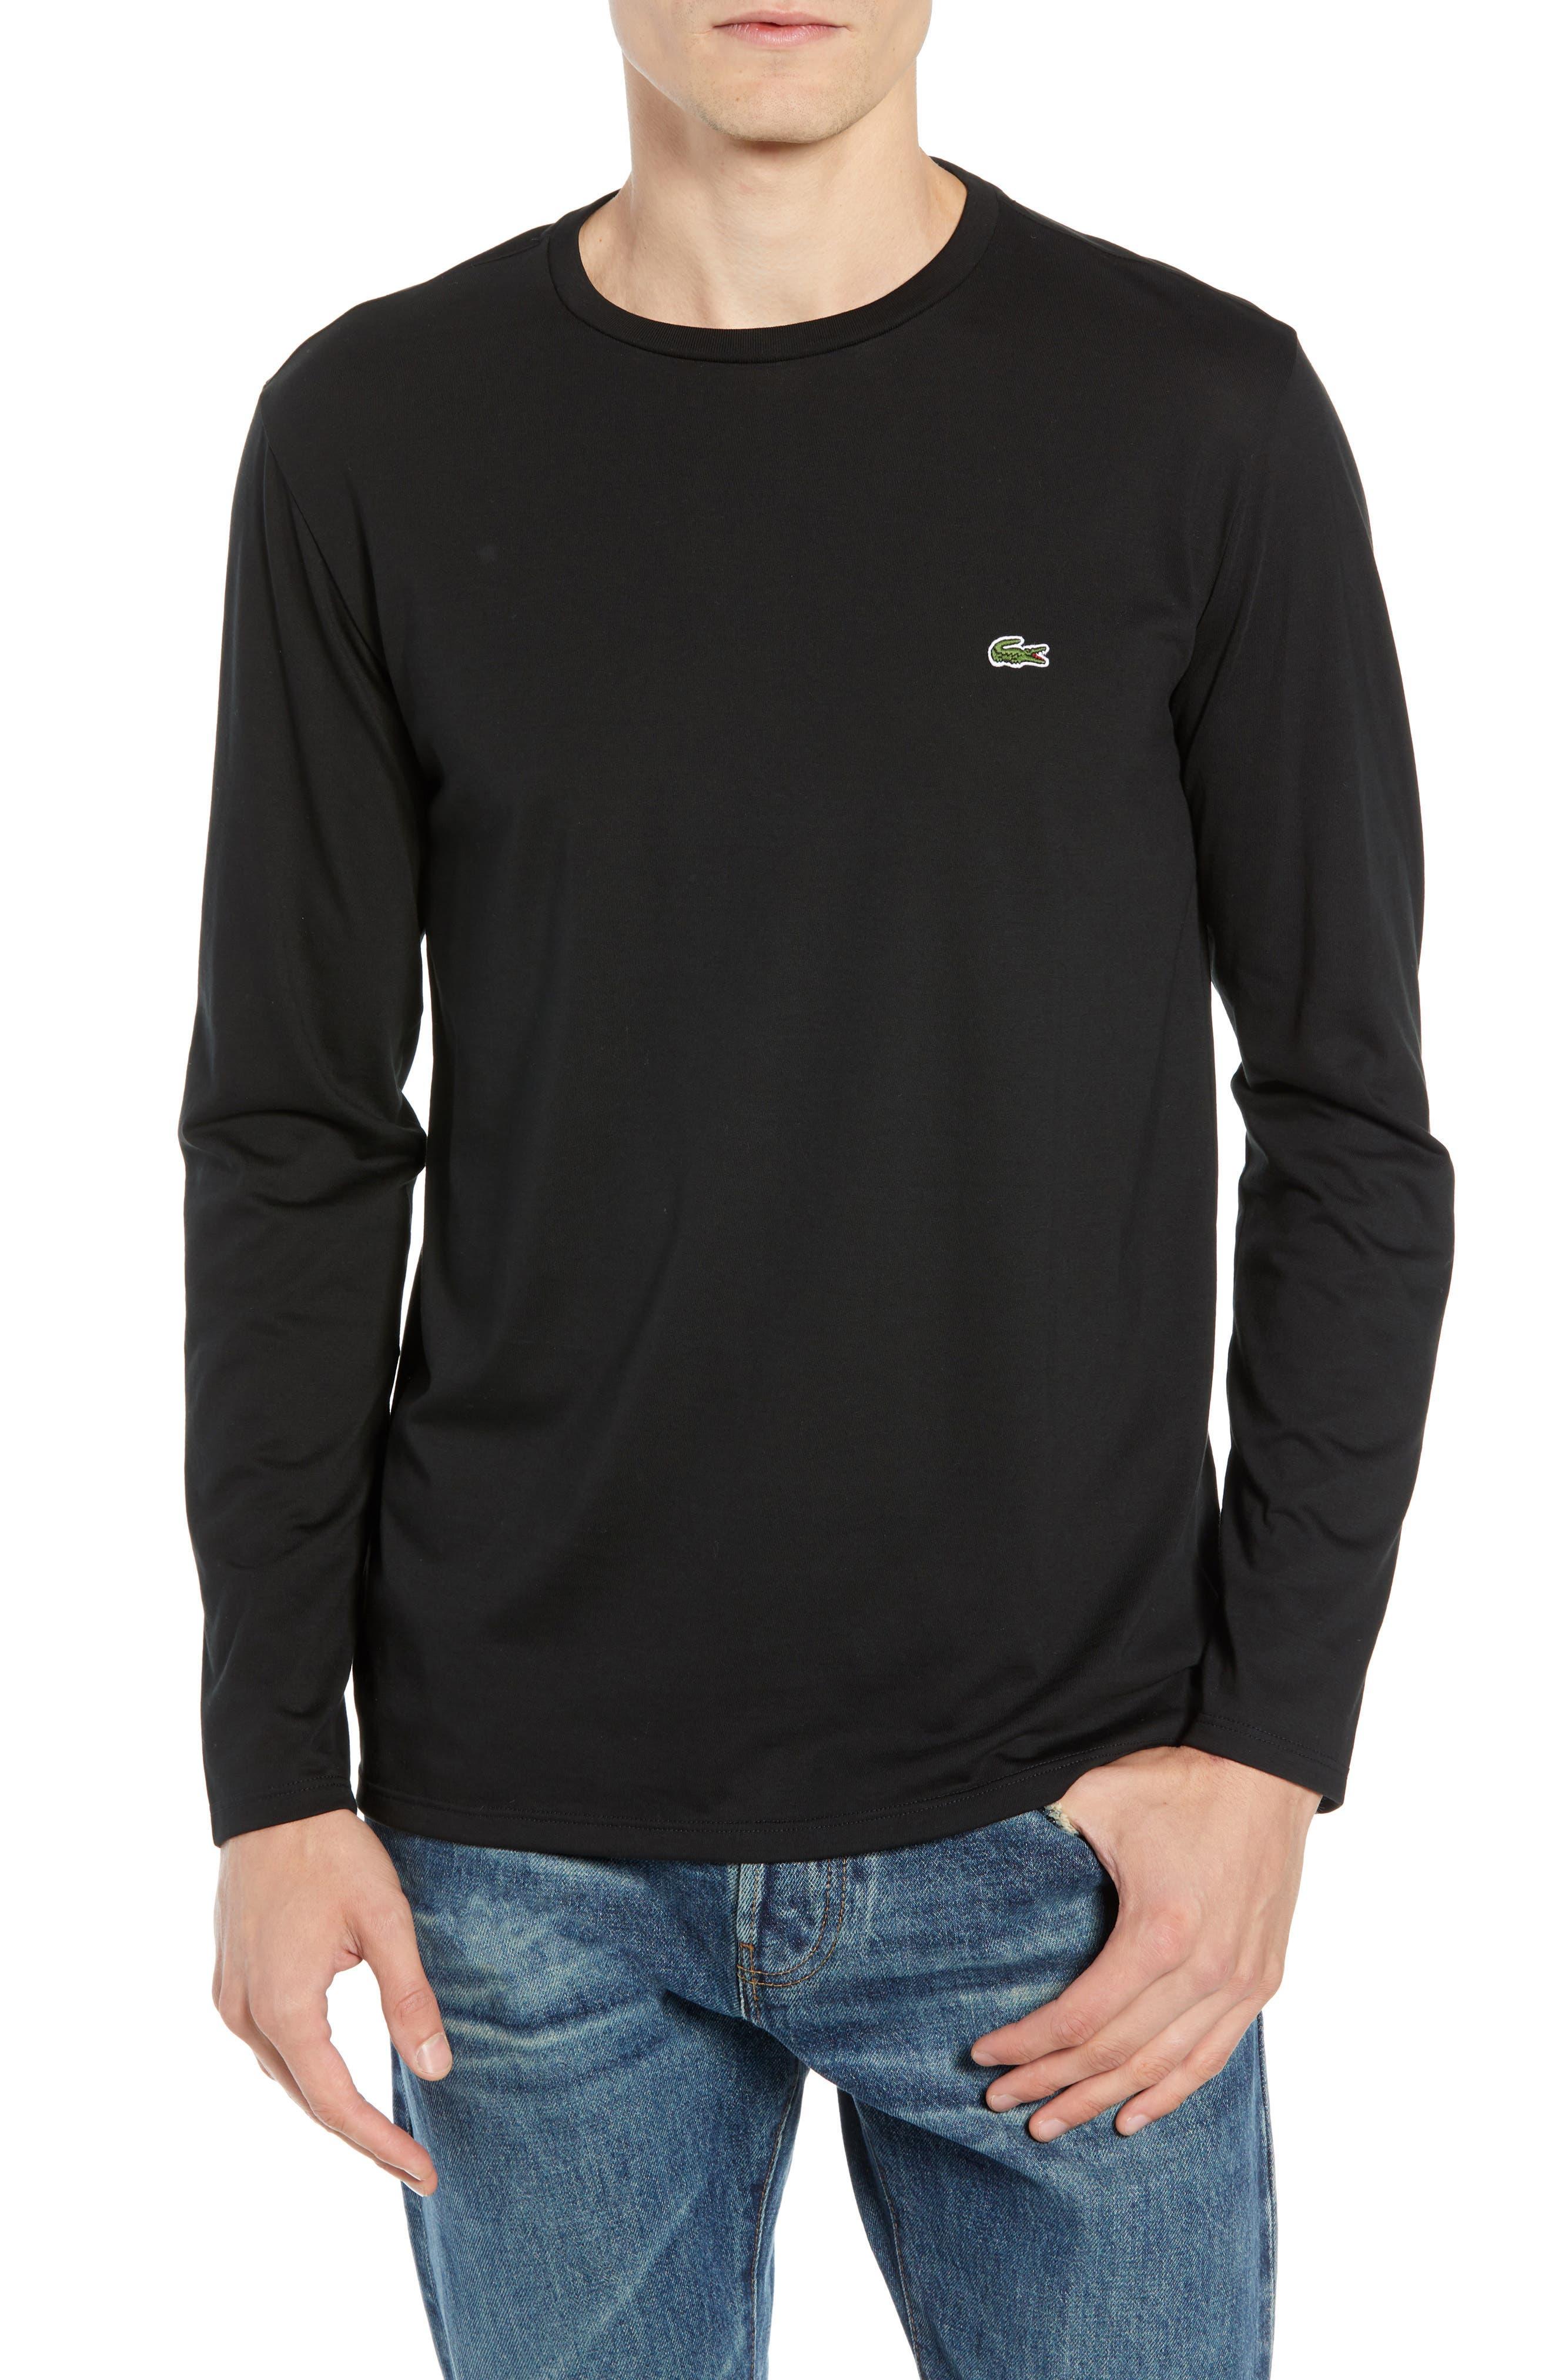 LACOSTE, Long Sleeve Pima Cotton T-Shirt, Main thumbnail 1, color, BLACK